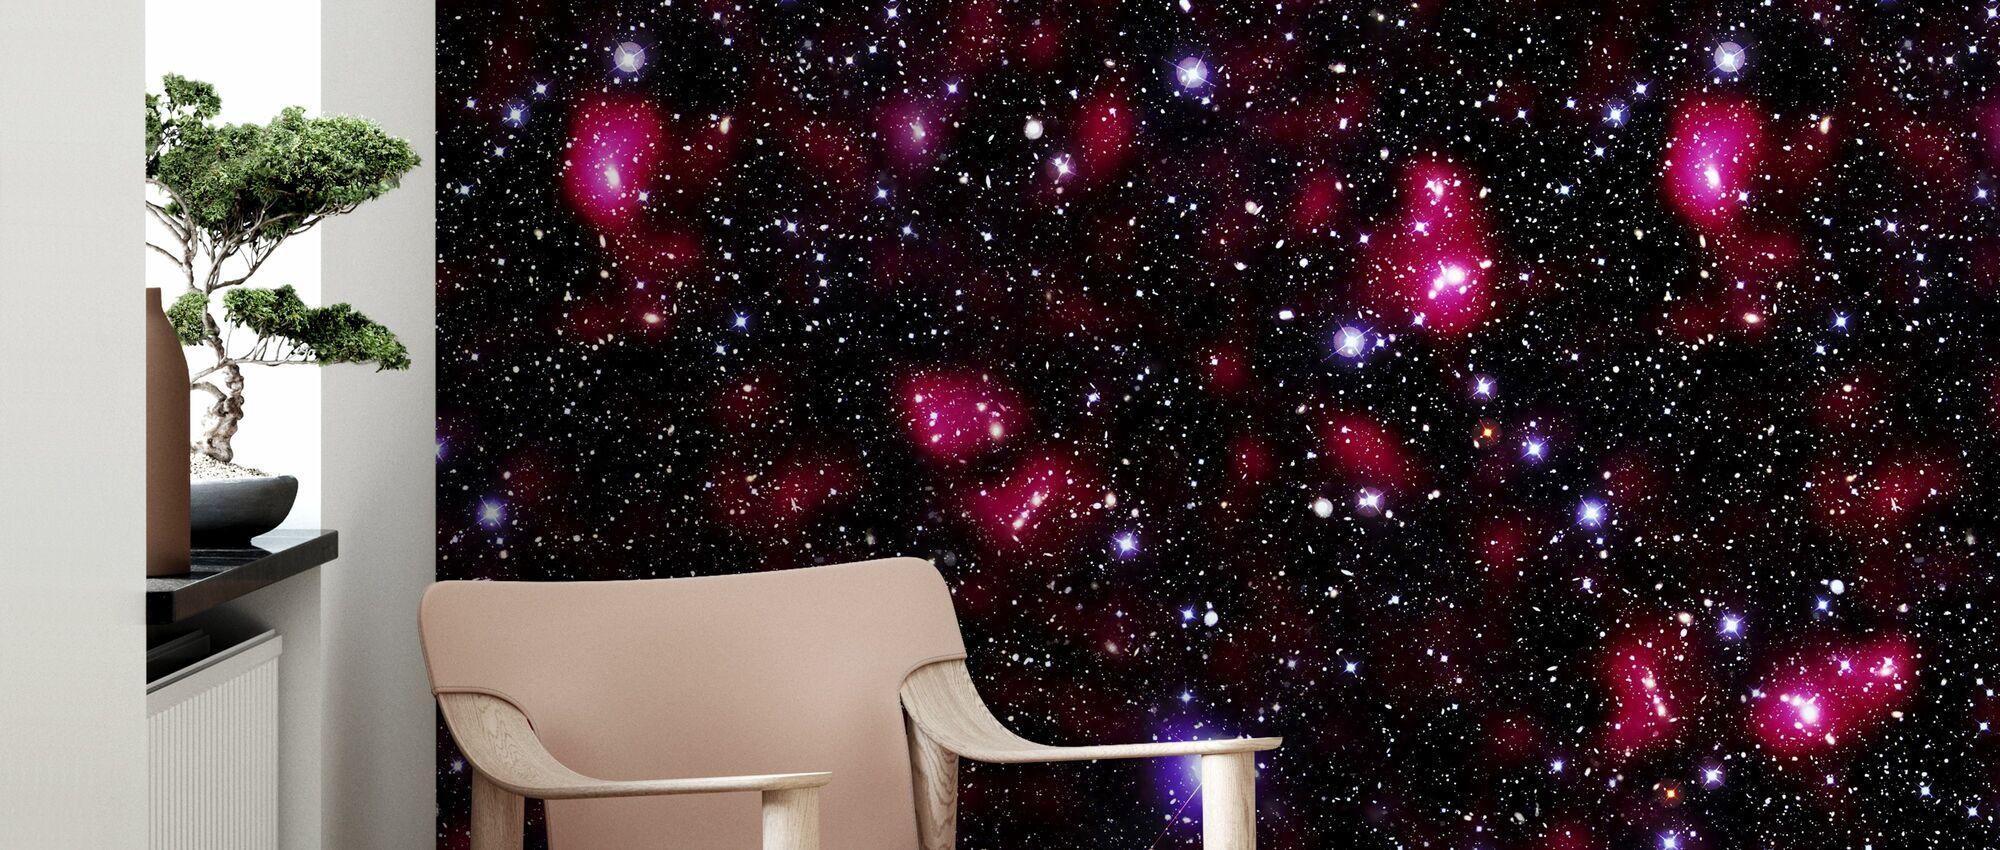 Red Starfield - Wallpaper - Living Room